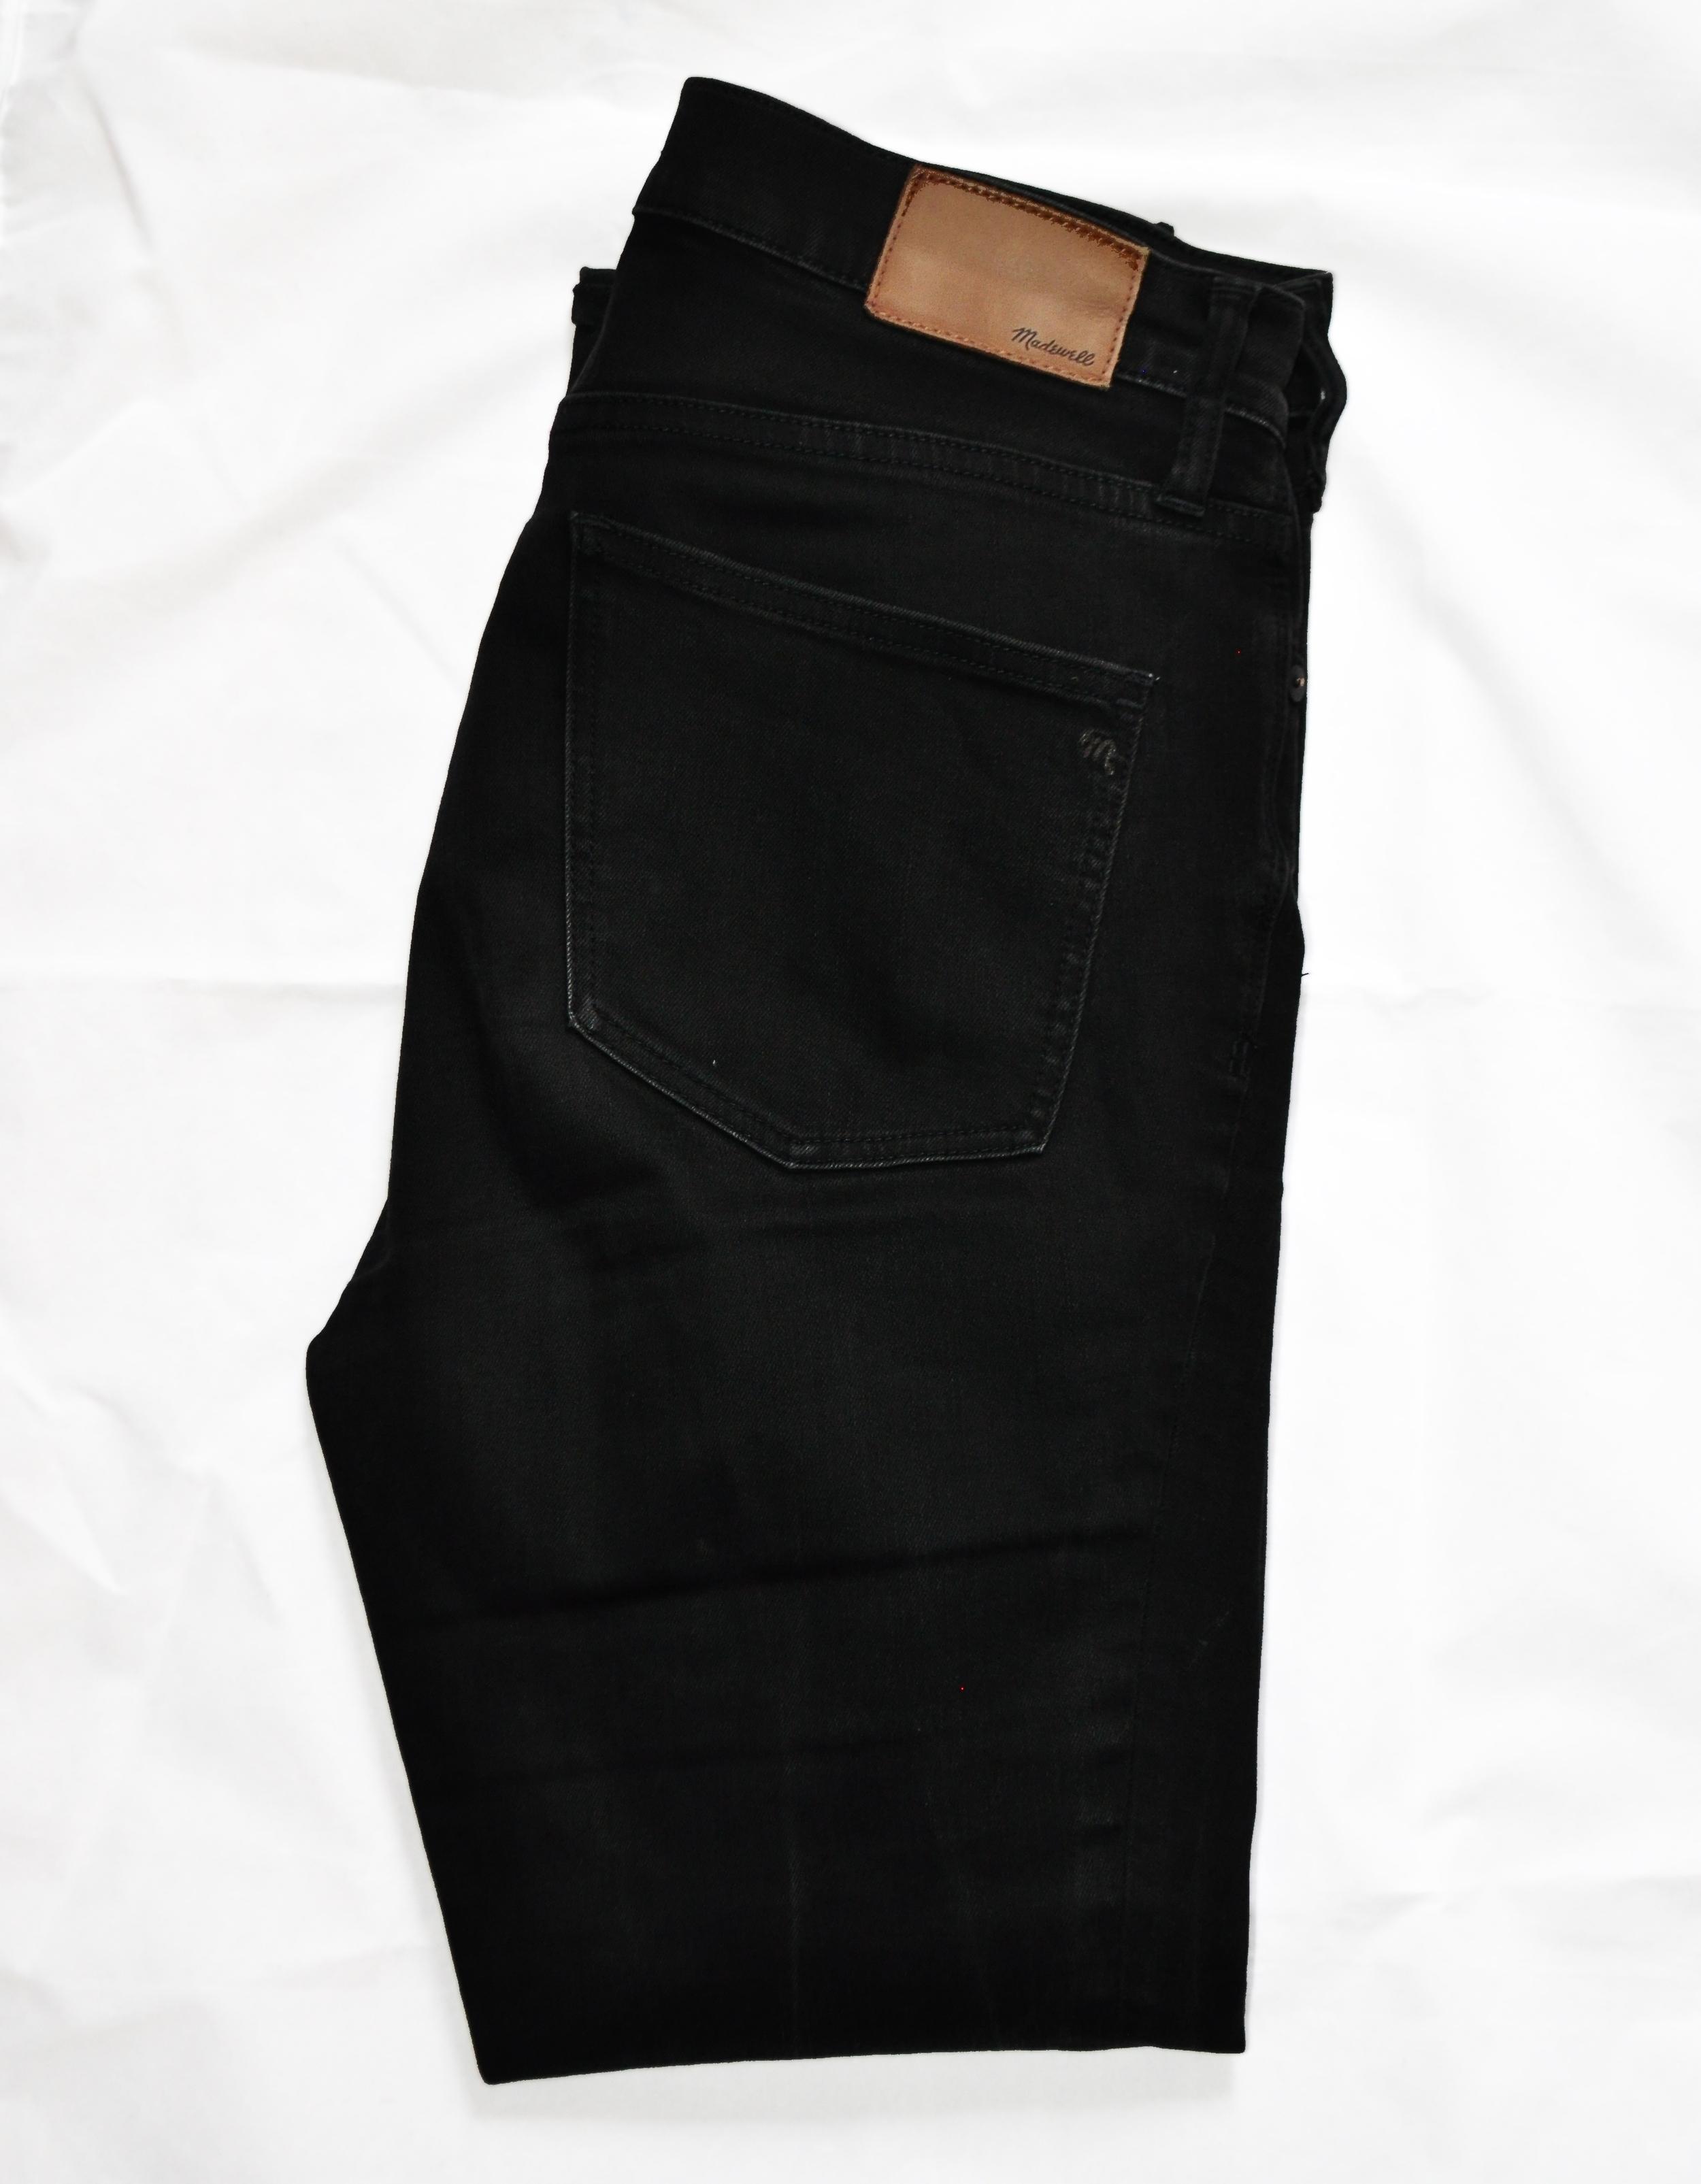 hunt for black jeans pic 2.jpg